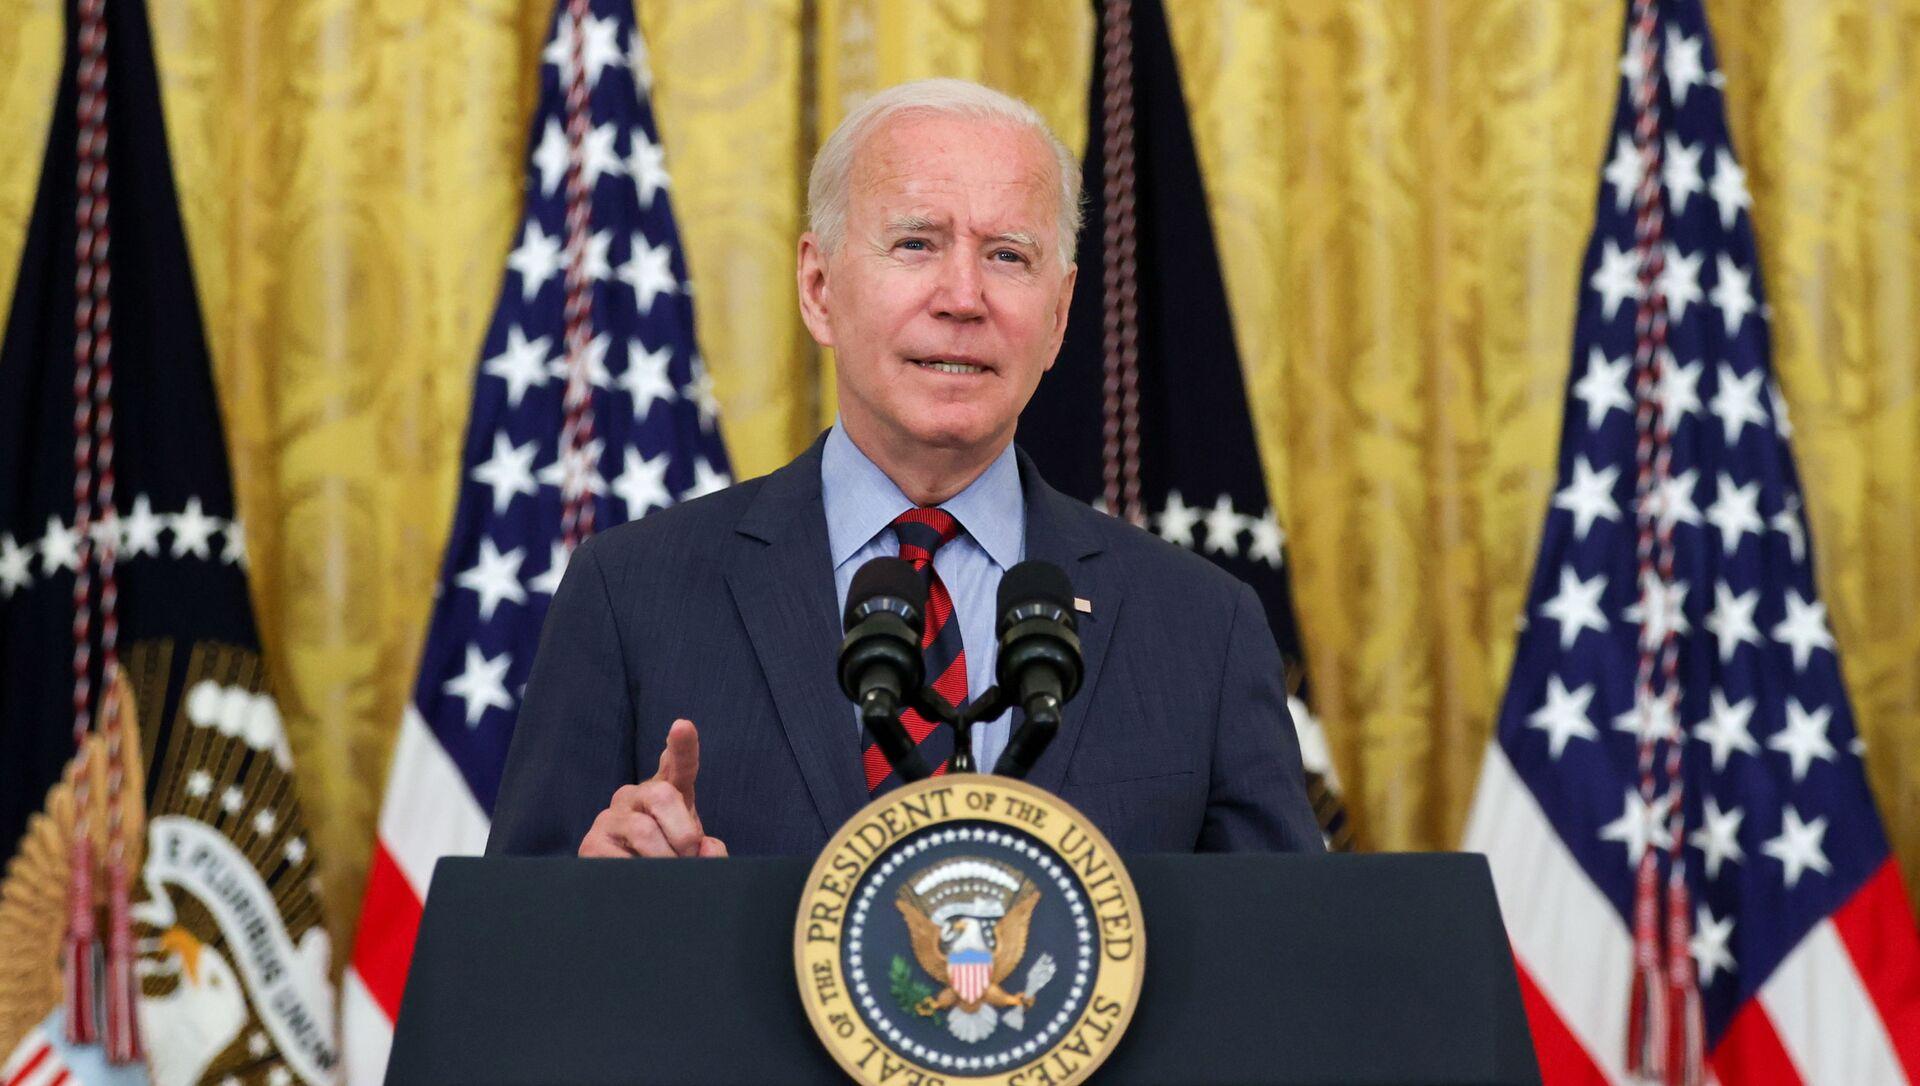 U.S. President Joe Biden delivers remarks at the White House in Washington, U.S. August 3, 2021. - Sputnik International, 1920, 04.08.2021